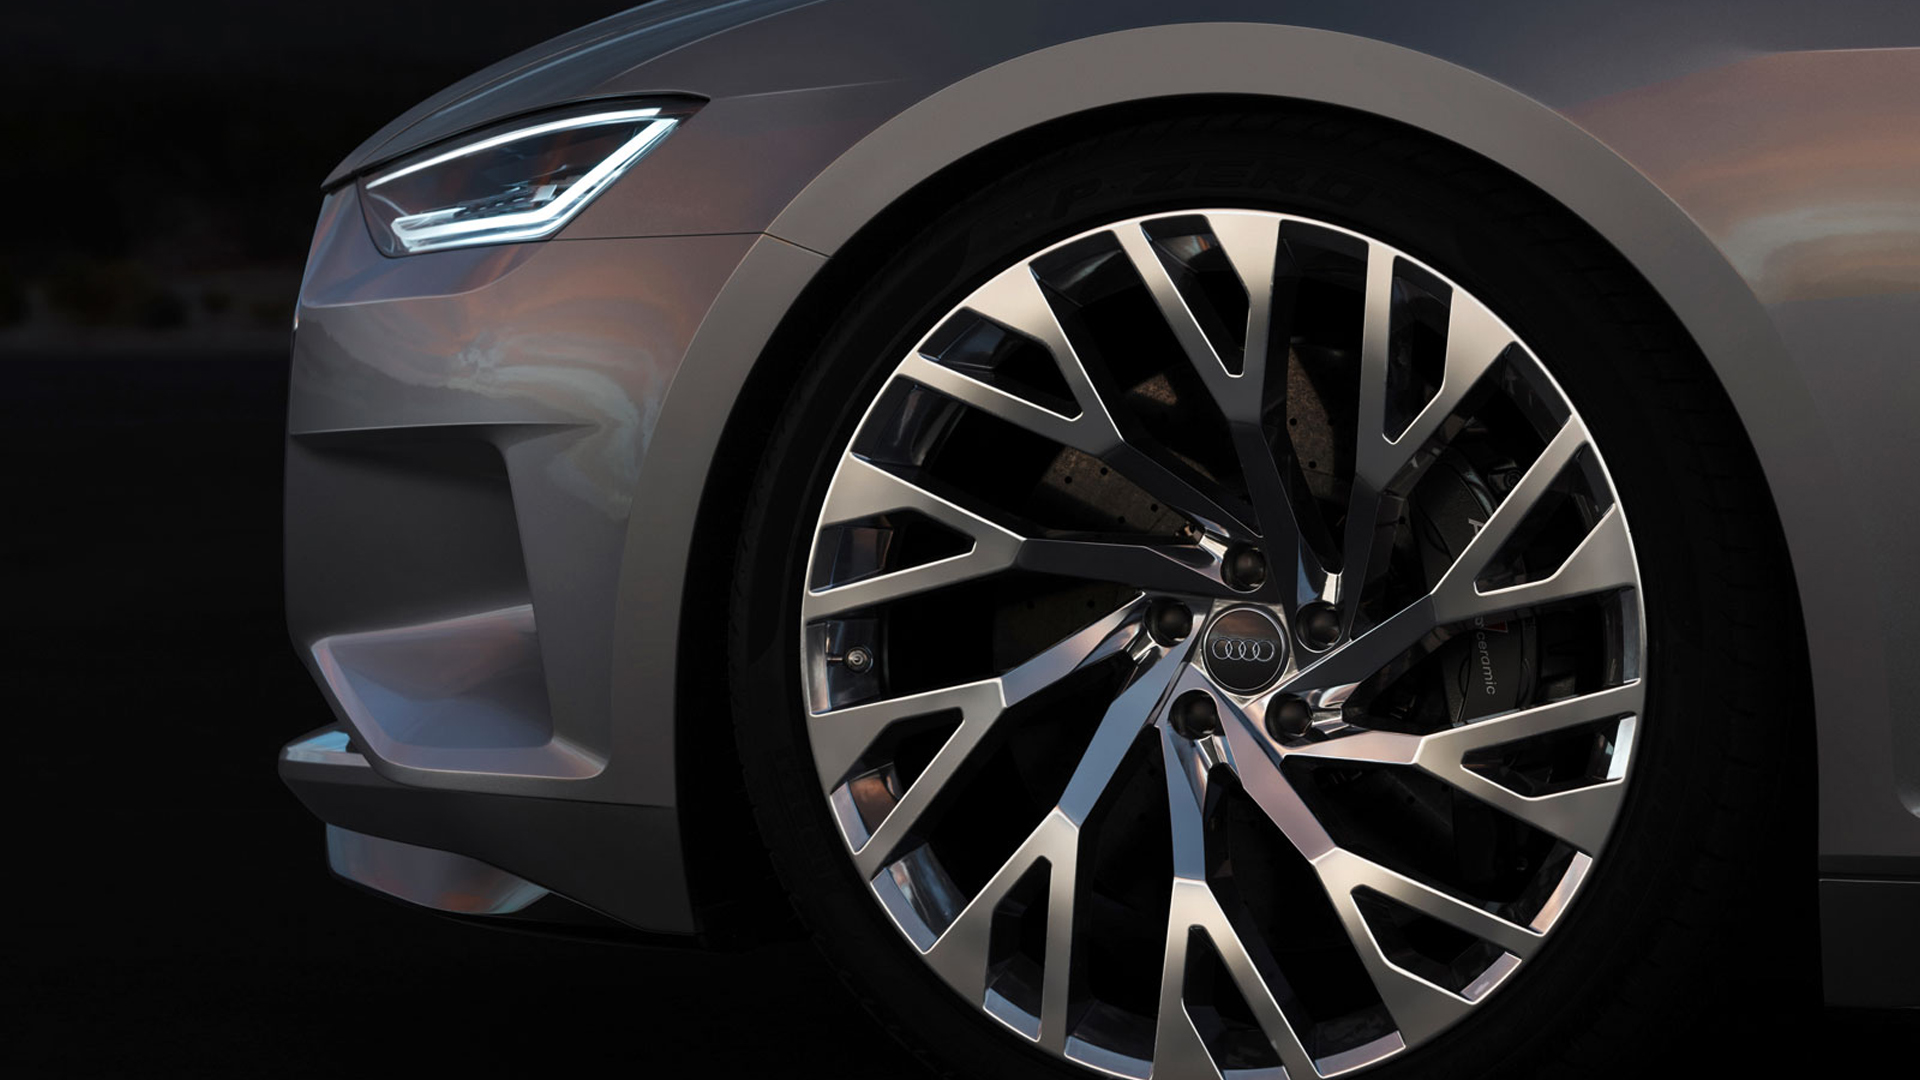 wp_audi_0005_Audi-Prologue-Concept-Wheel-design